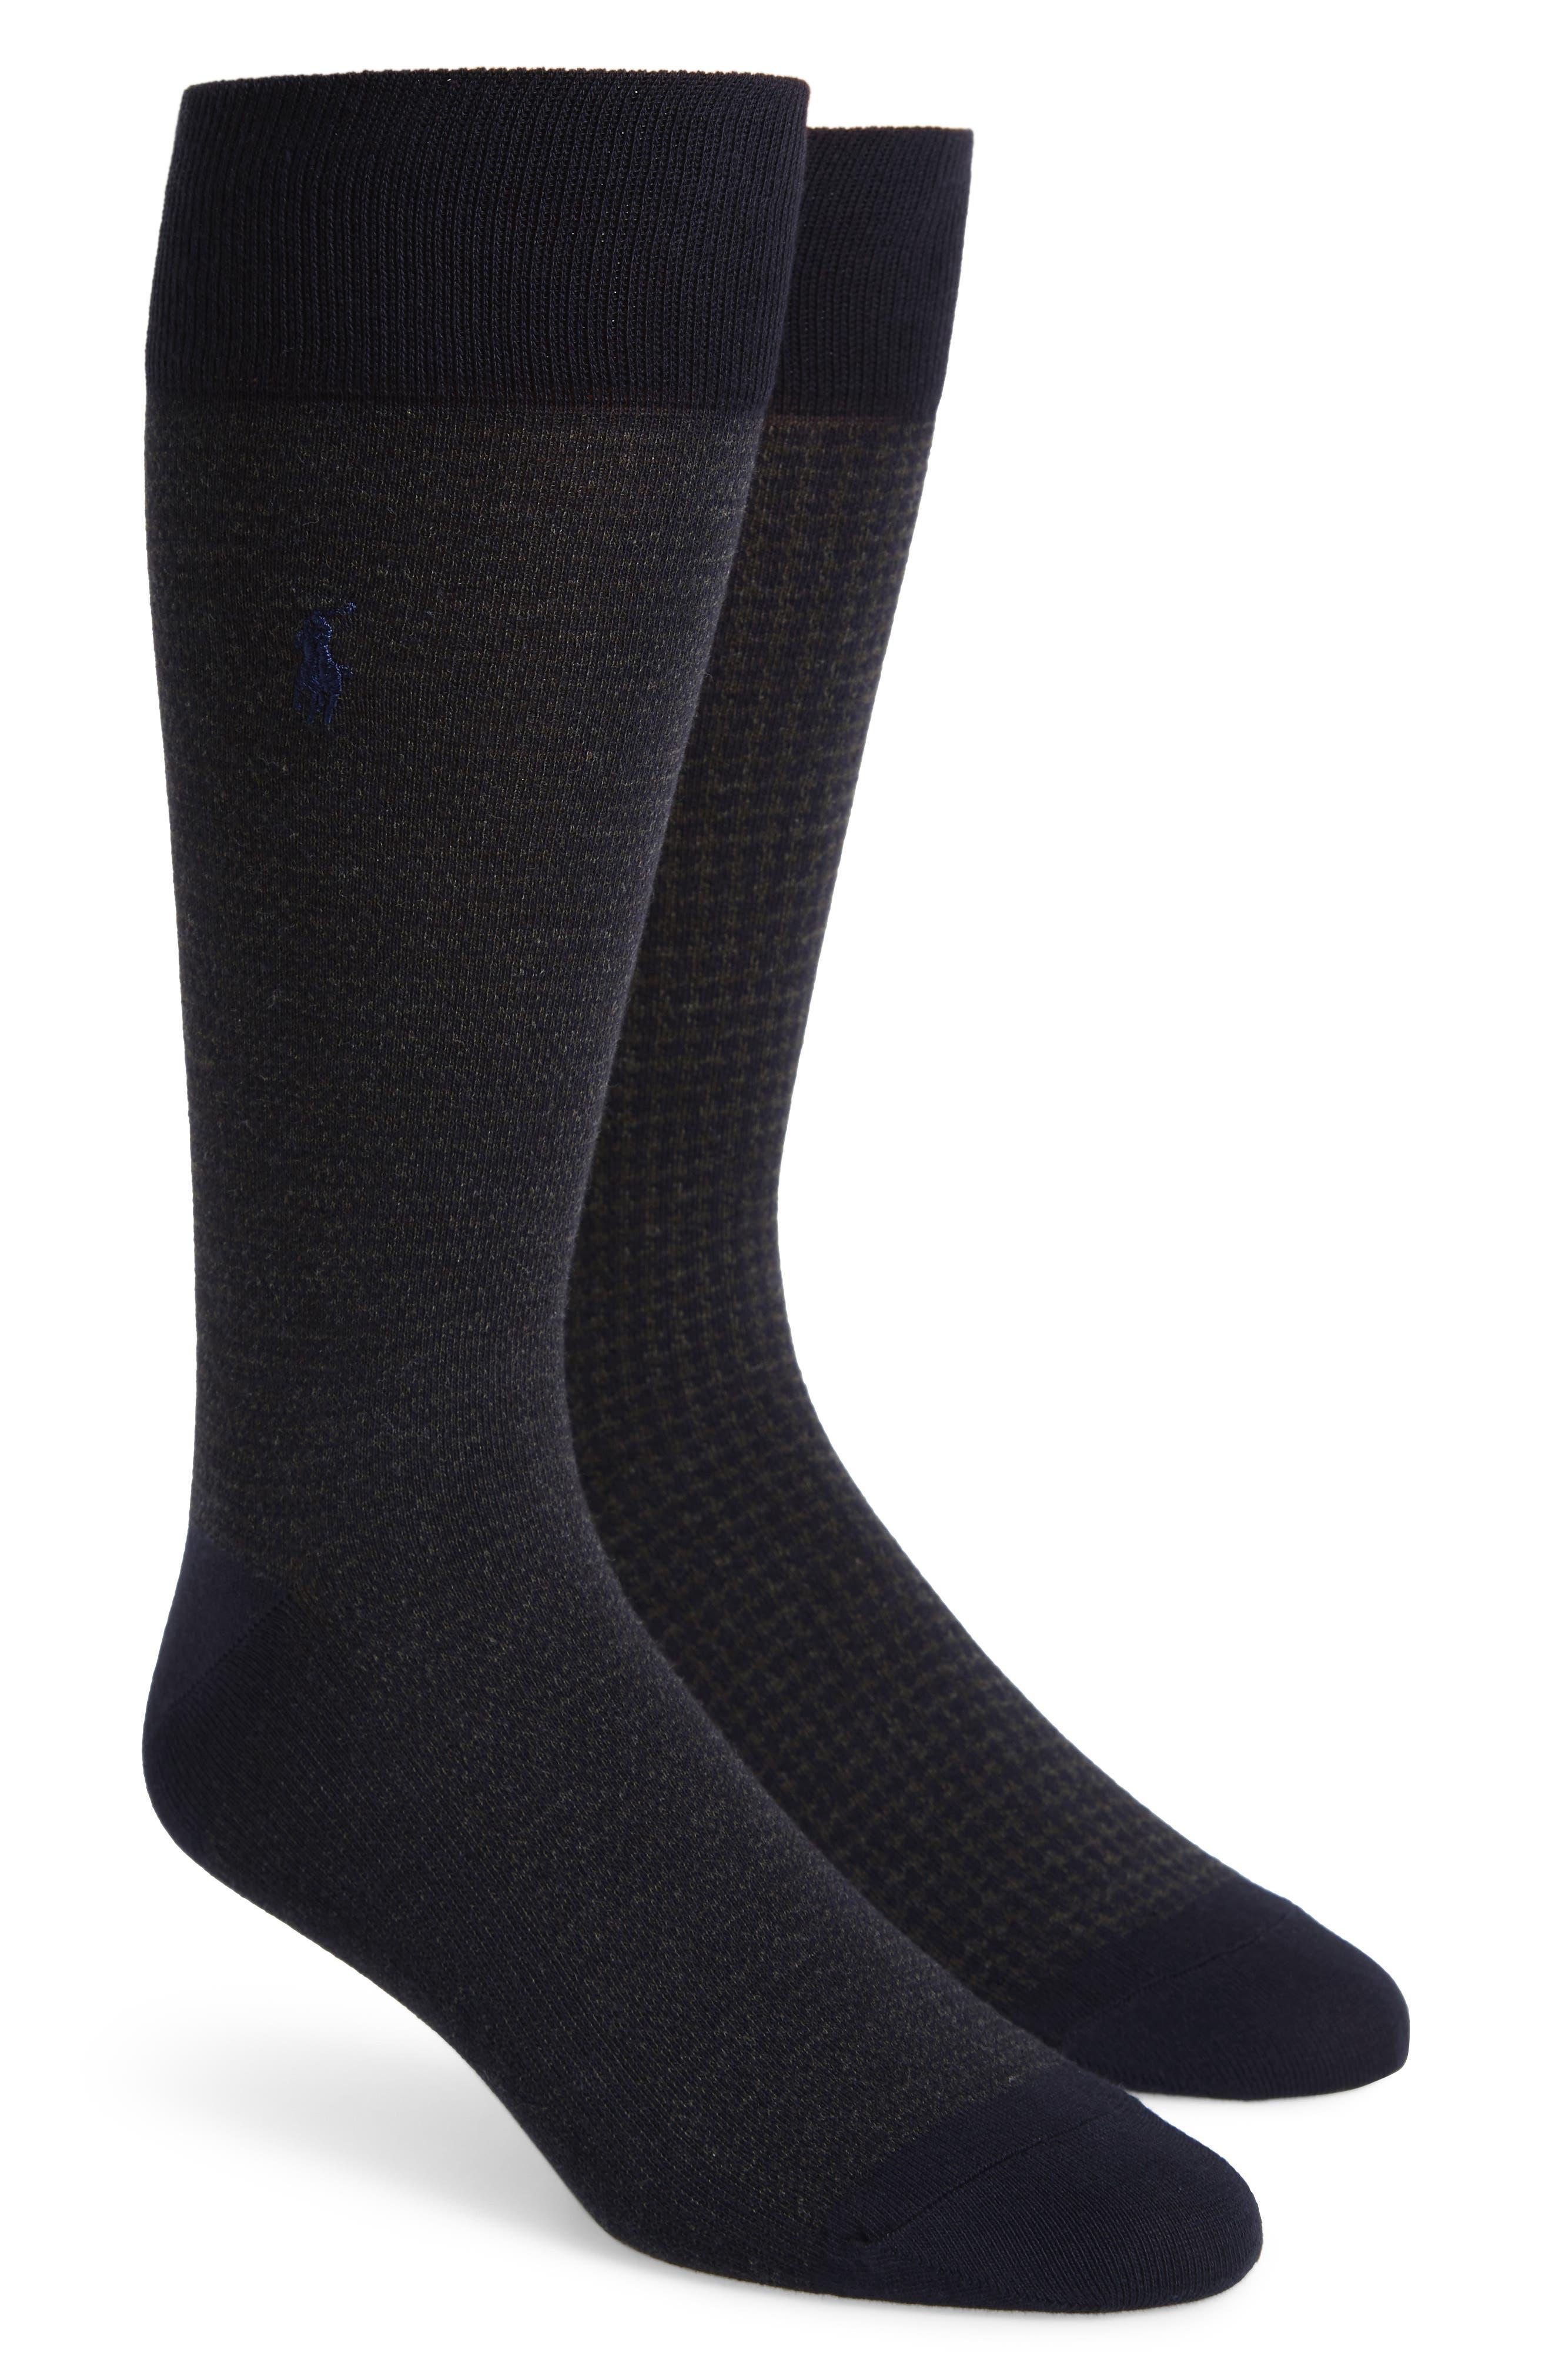 2-Pack Assorted Houndstooth Dress Socks,                         Main,                         color, Navy